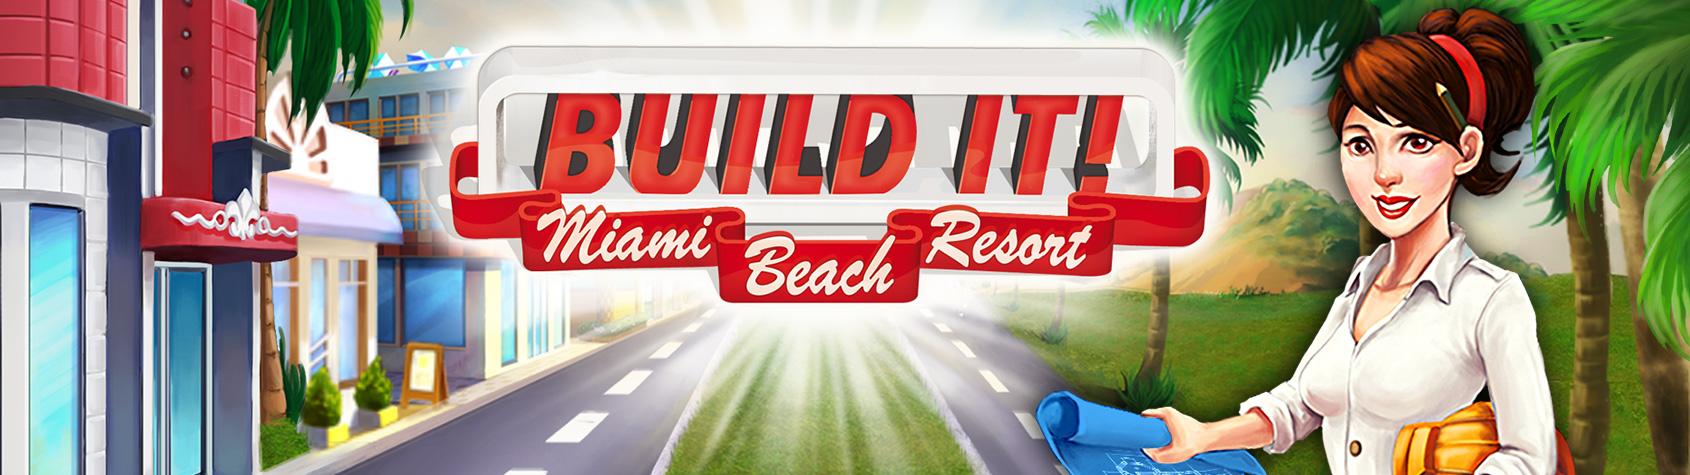 Build It! Miami Beach Resort HD